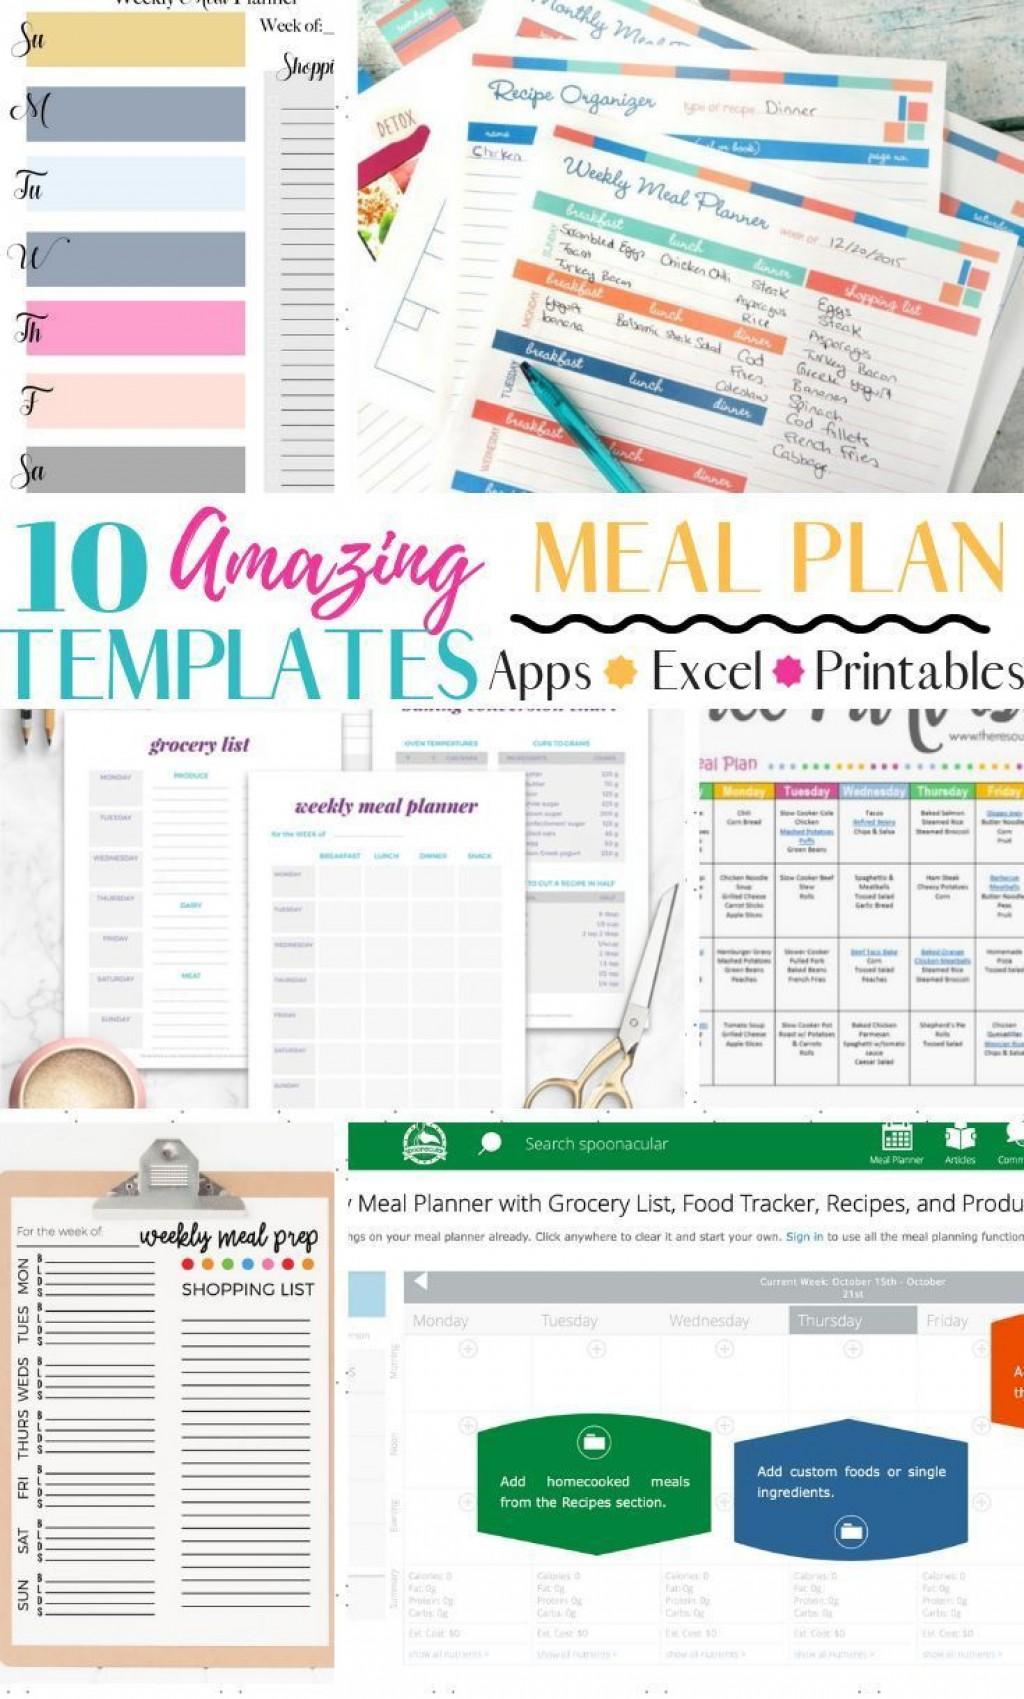 004 Striking Weekly Meal Plan Template App Photo  Apple PageLarge